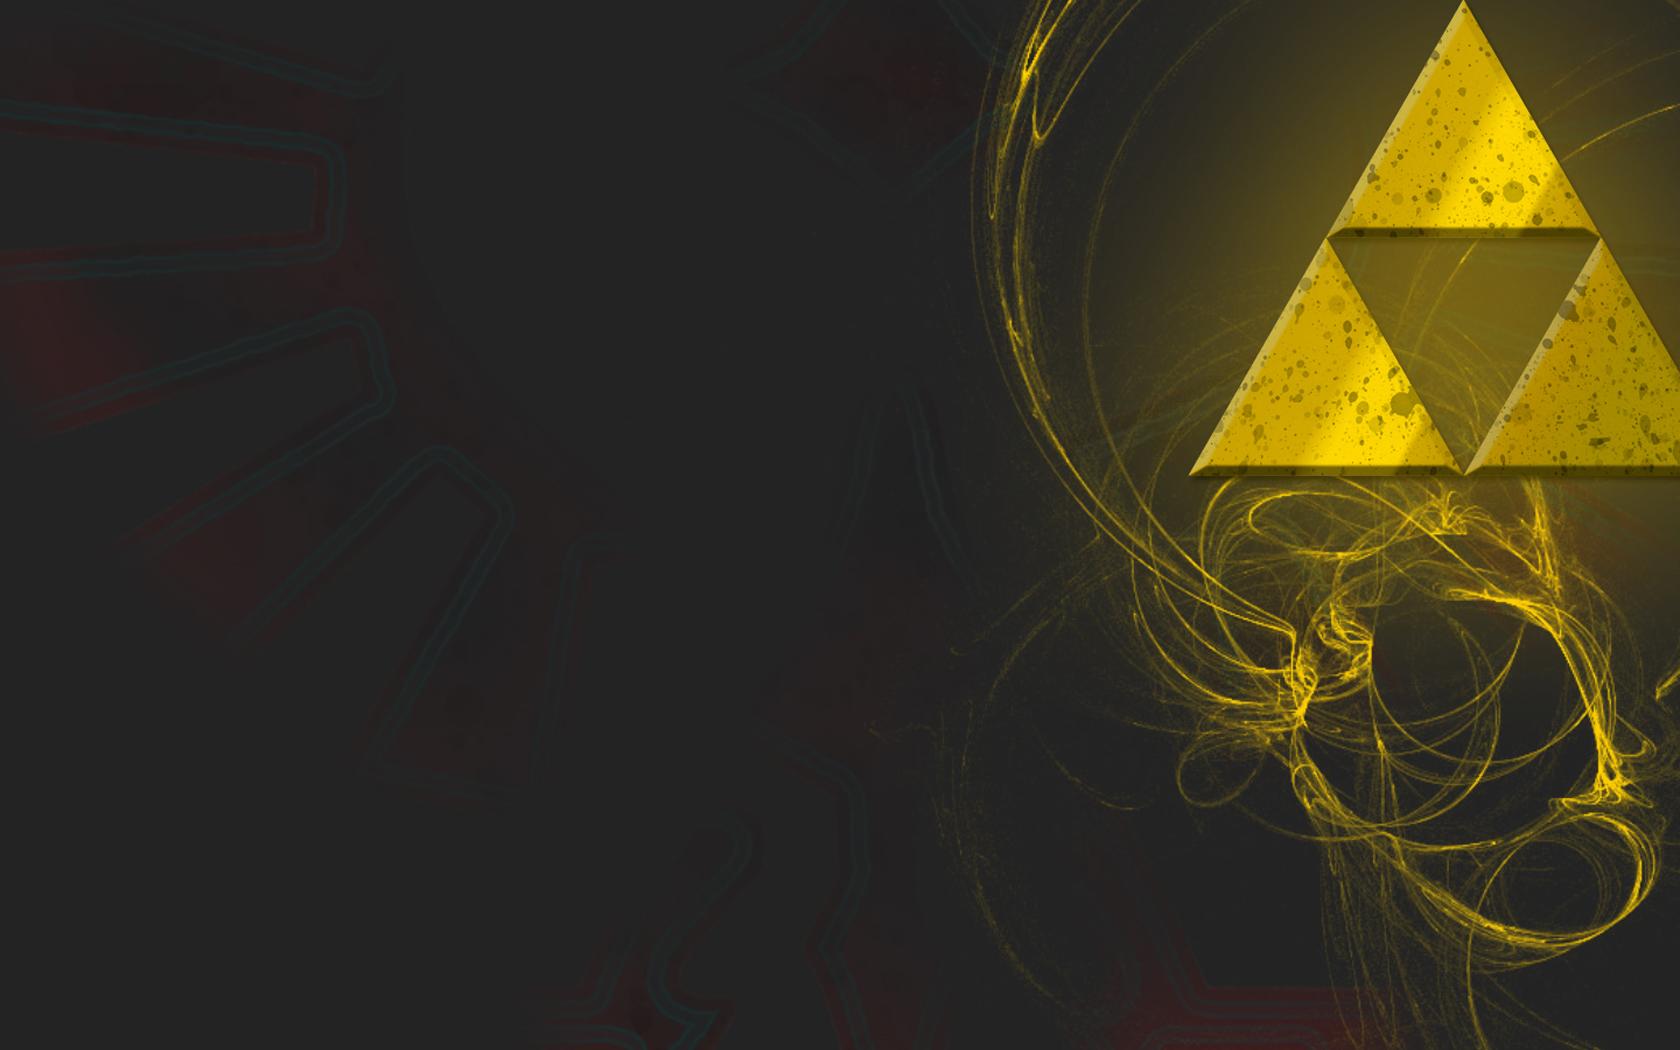 Legend Of Zelda Full HD Quality Wallpapers, 48+ Widescreen Wallpapers